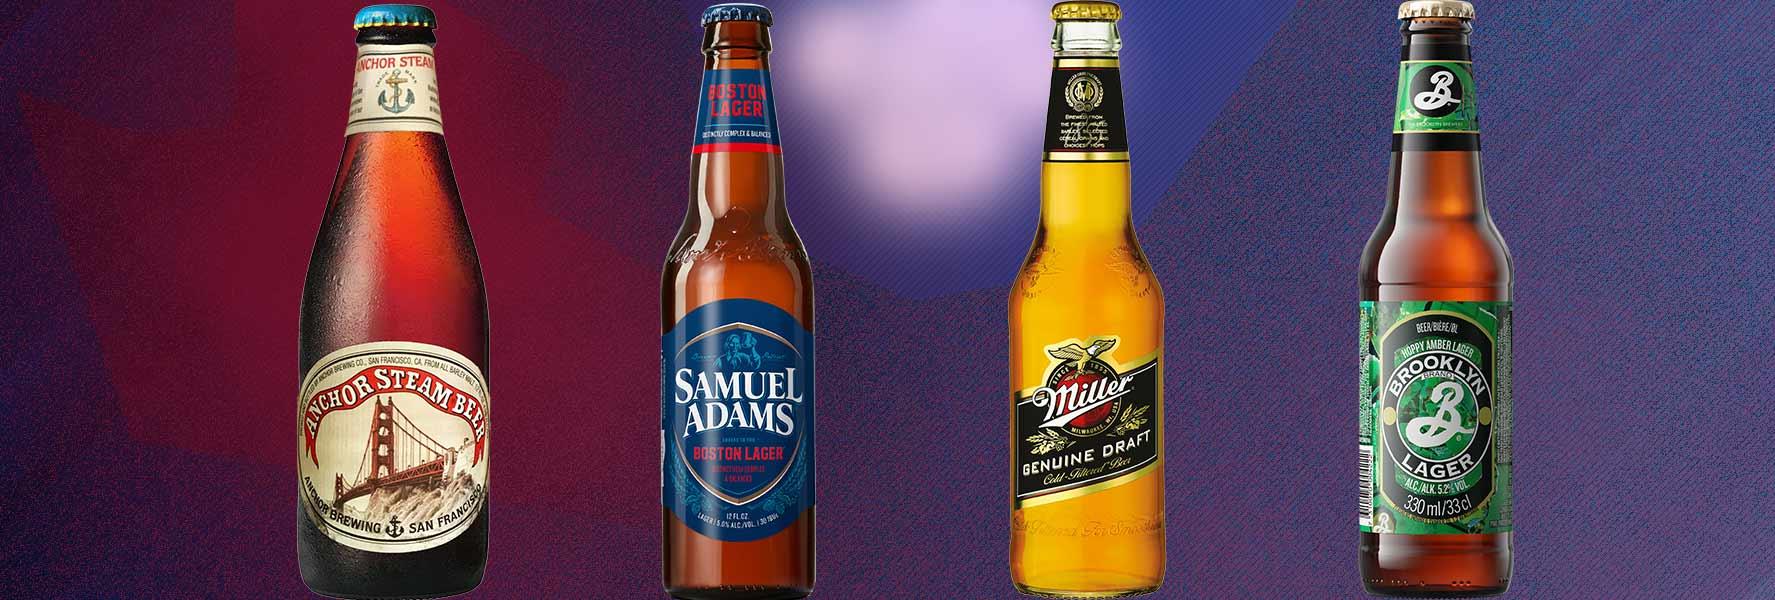 American Lager Bier Empfehlung